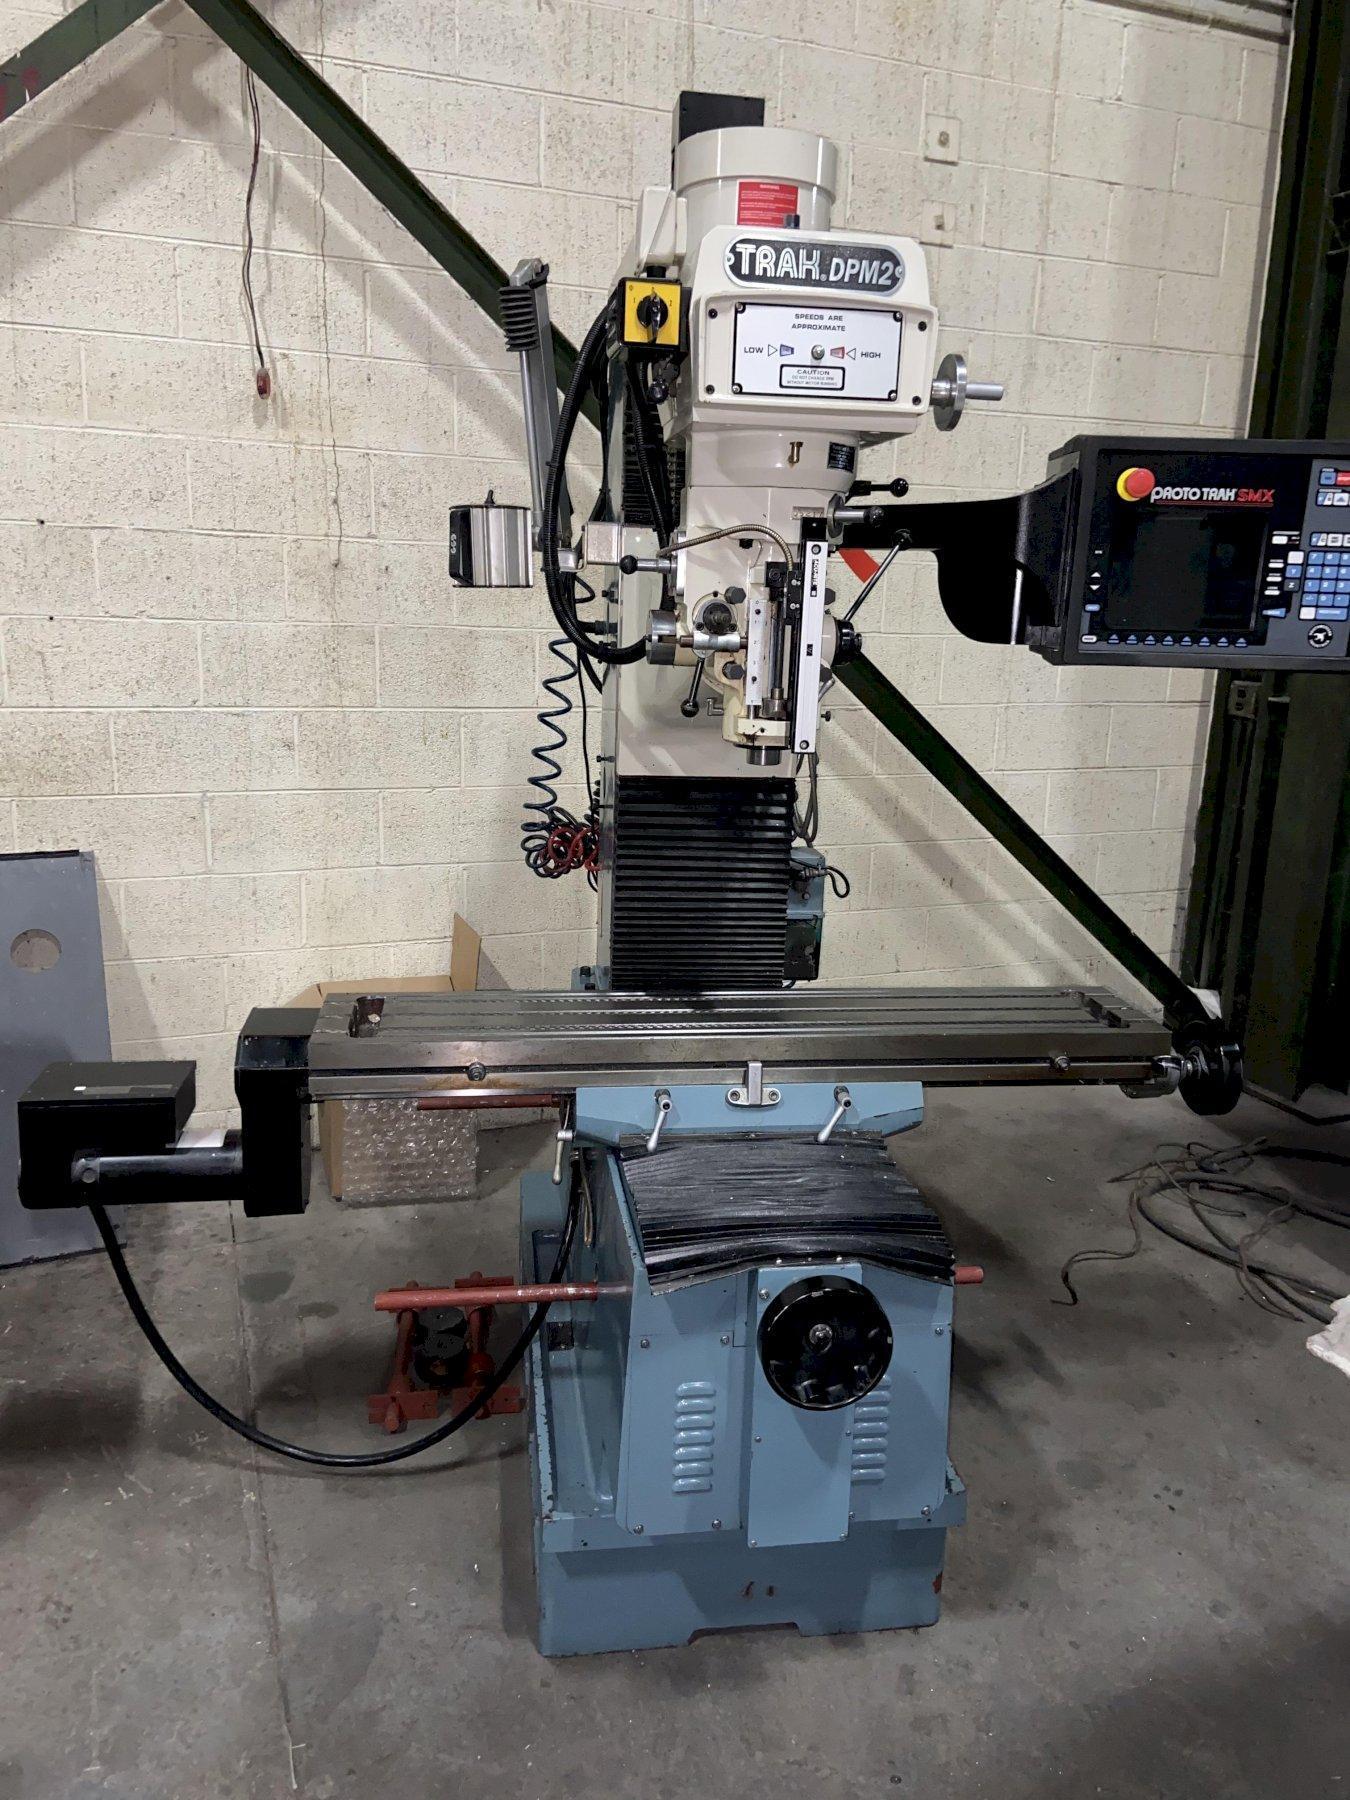 Southwestern Industries DPM2 CNC Mill, Prototrak SMX, 9